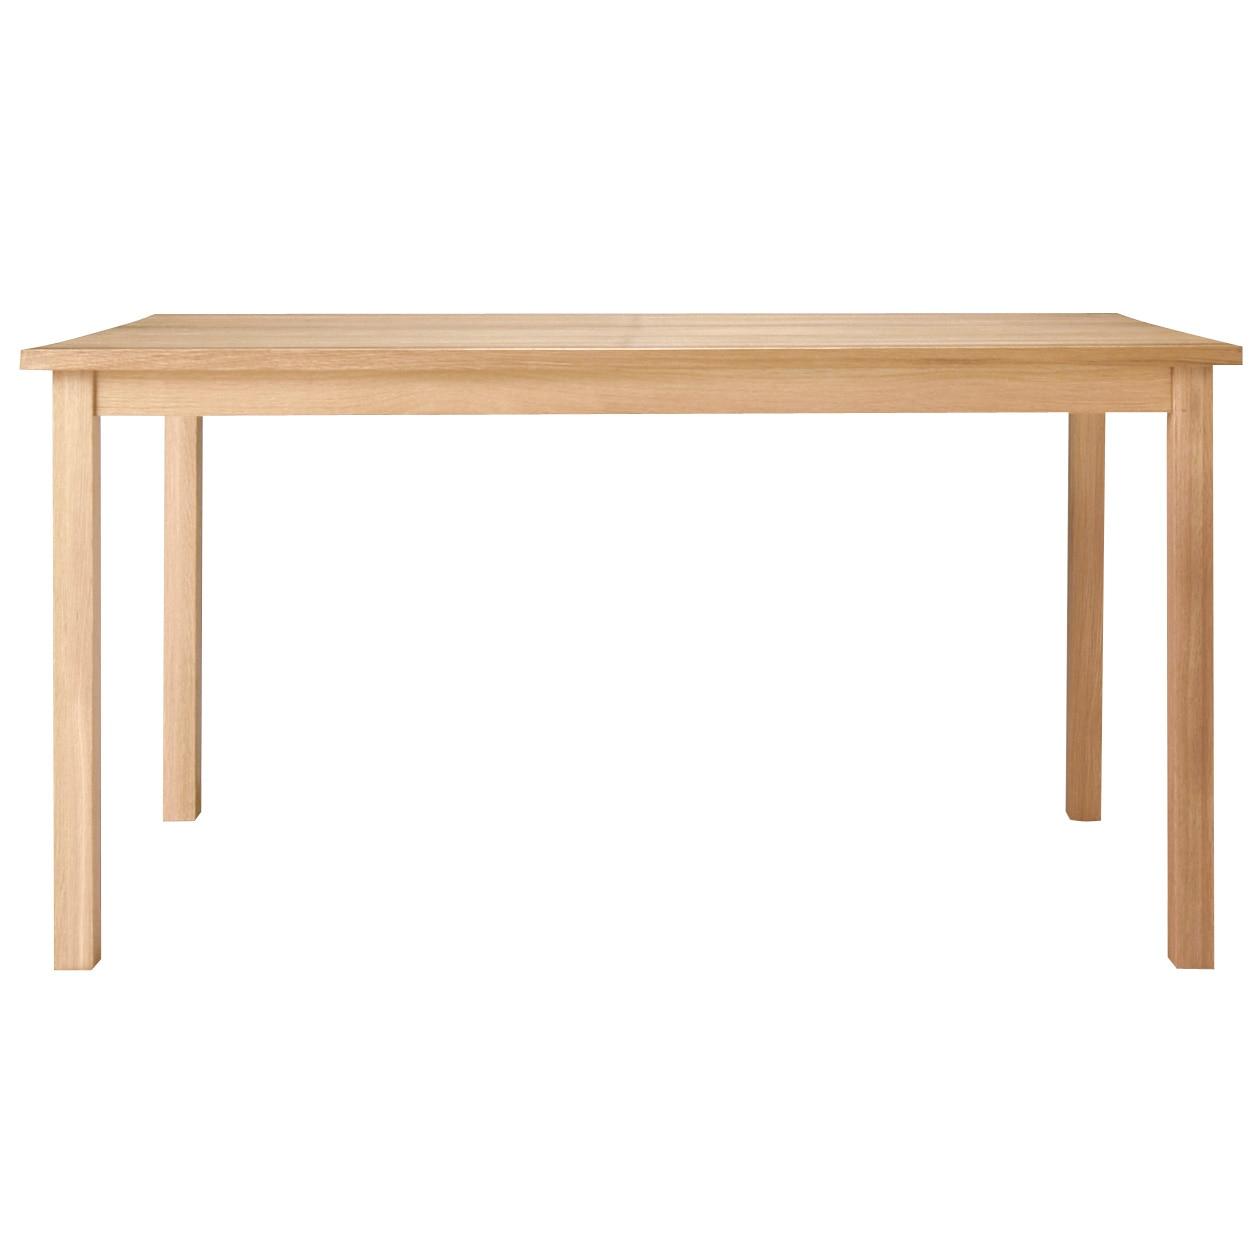 RoomClip商品情報 - 無垢材テーブル・オーク材・幅140cm